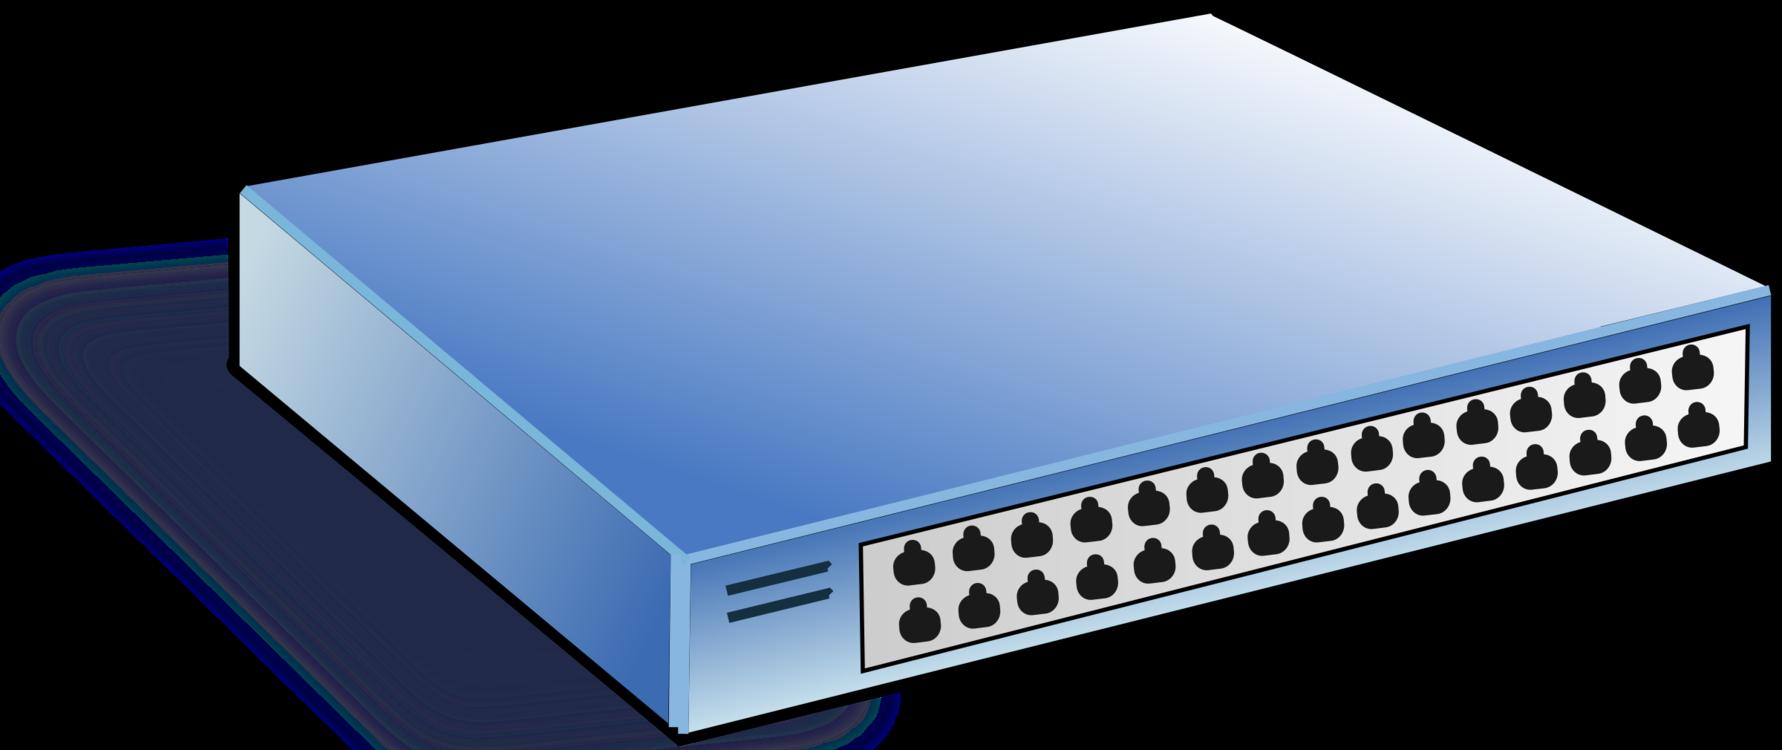 Computer Network,Electronics Accessory,Ethernet Hub